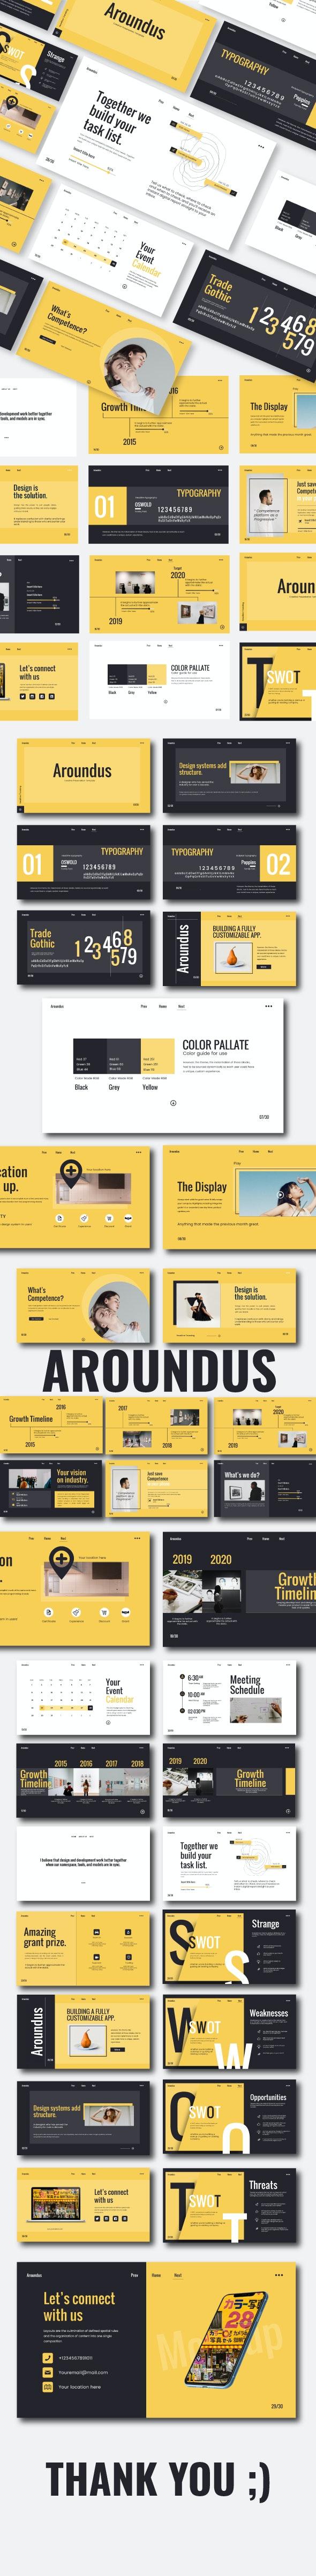 Aroundus Keynote Template - Keynote Templates Presentation Templates